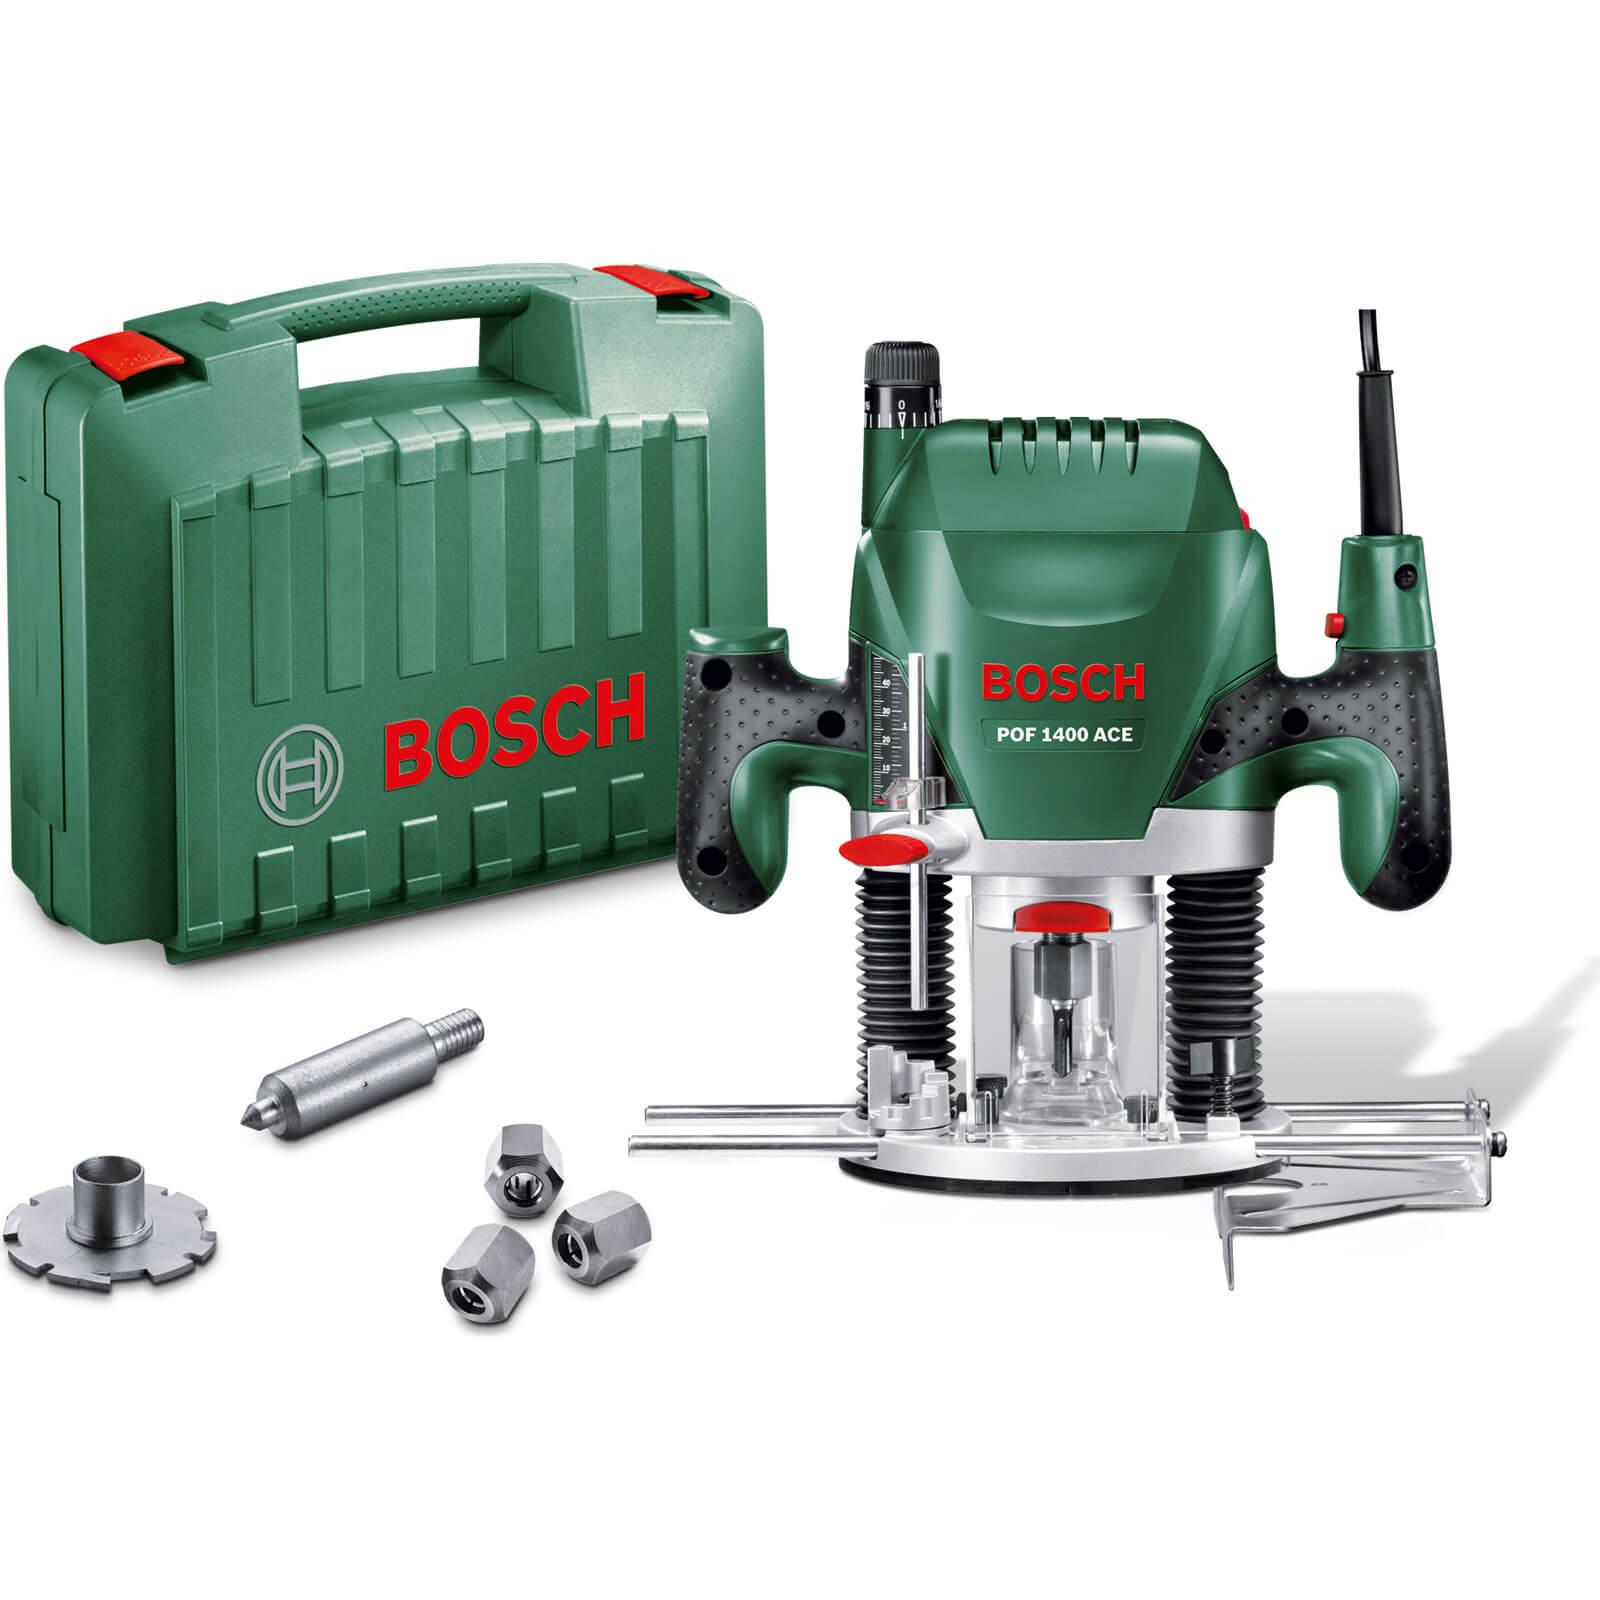 Bosch POF 1400ACE 1 4 Plunge Router 1400w 240v